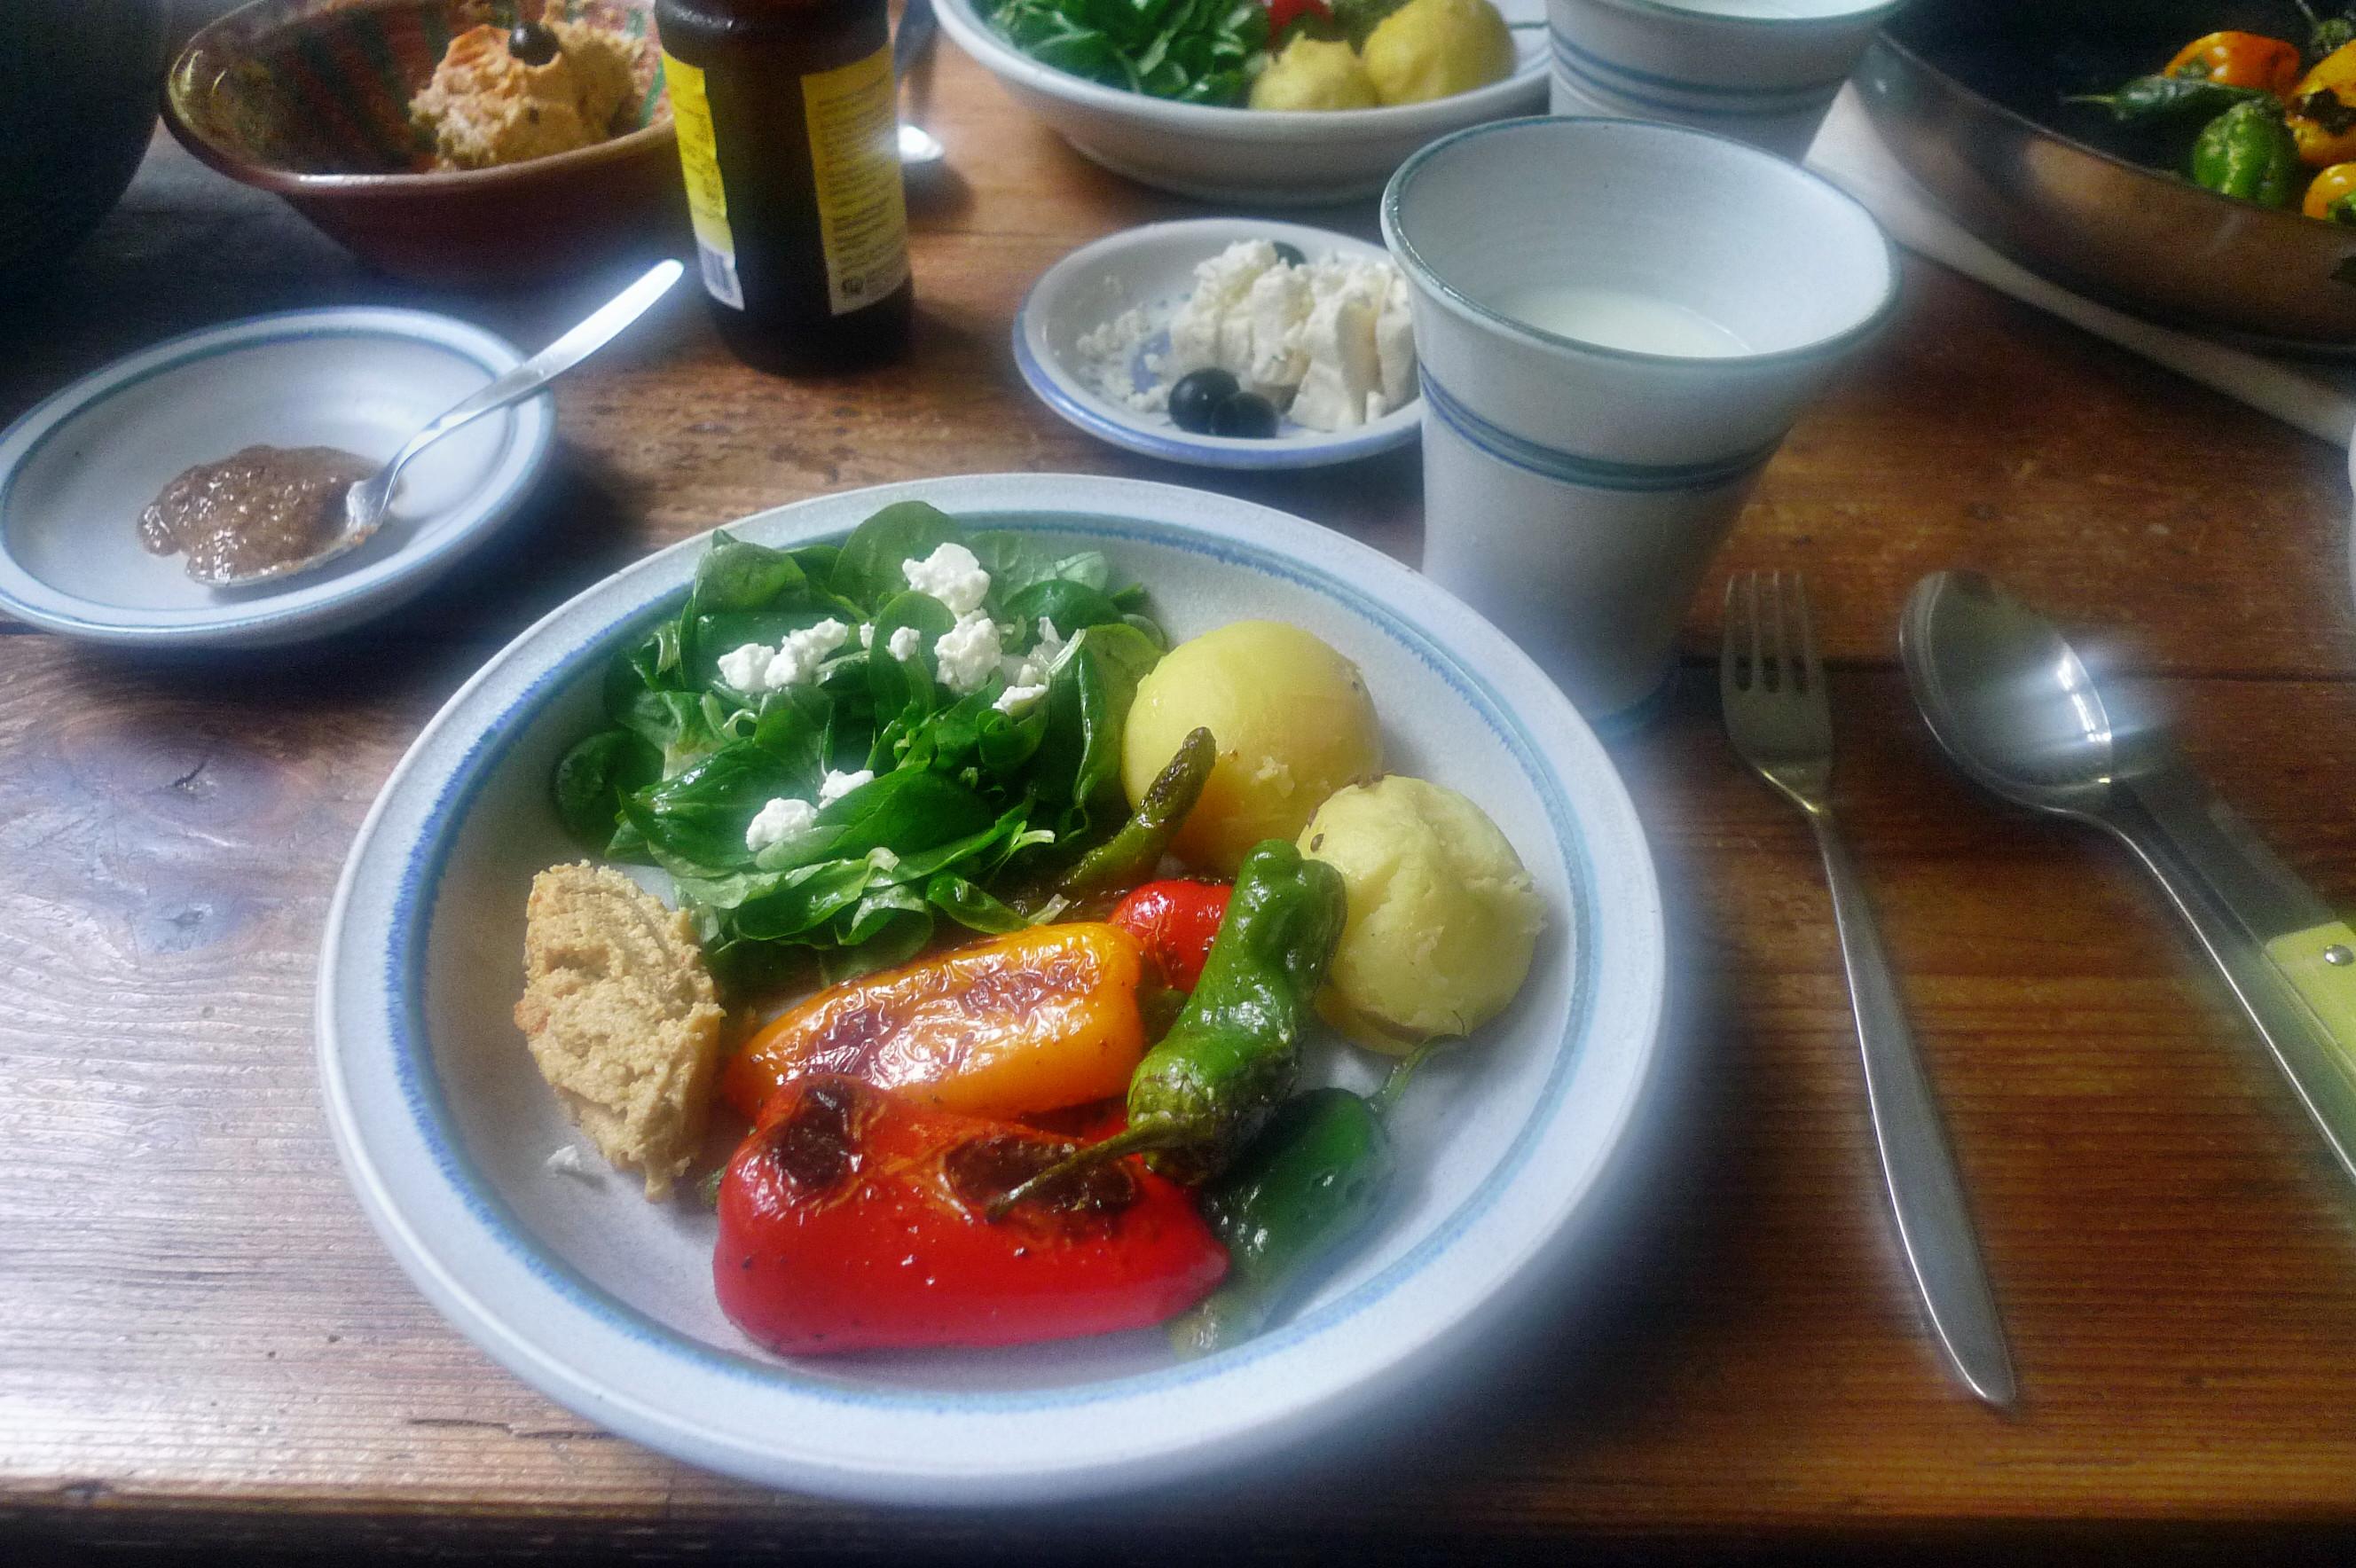 Pimentos-Paprika-Kartoffel-Salat-Buttermilch- 28.9.14   (11)